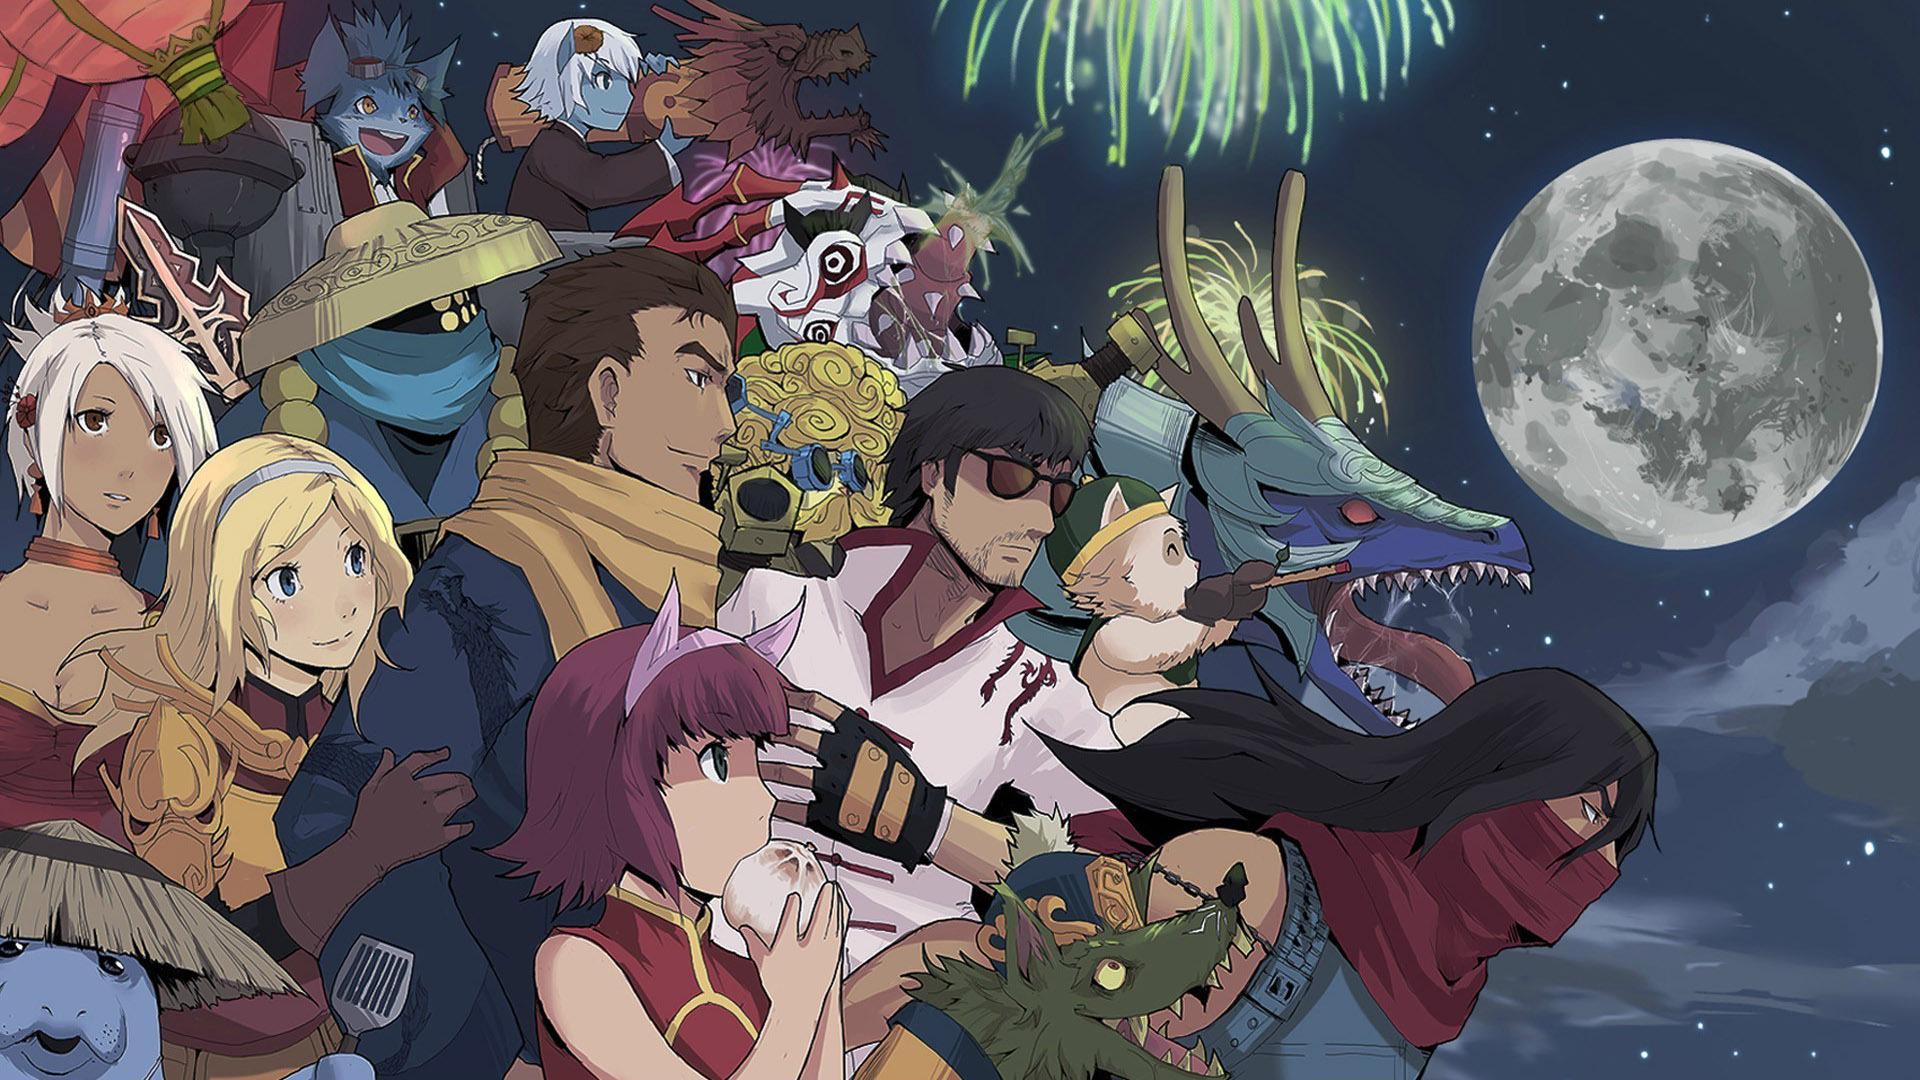 Image Result For Anime Wallpaper Lol